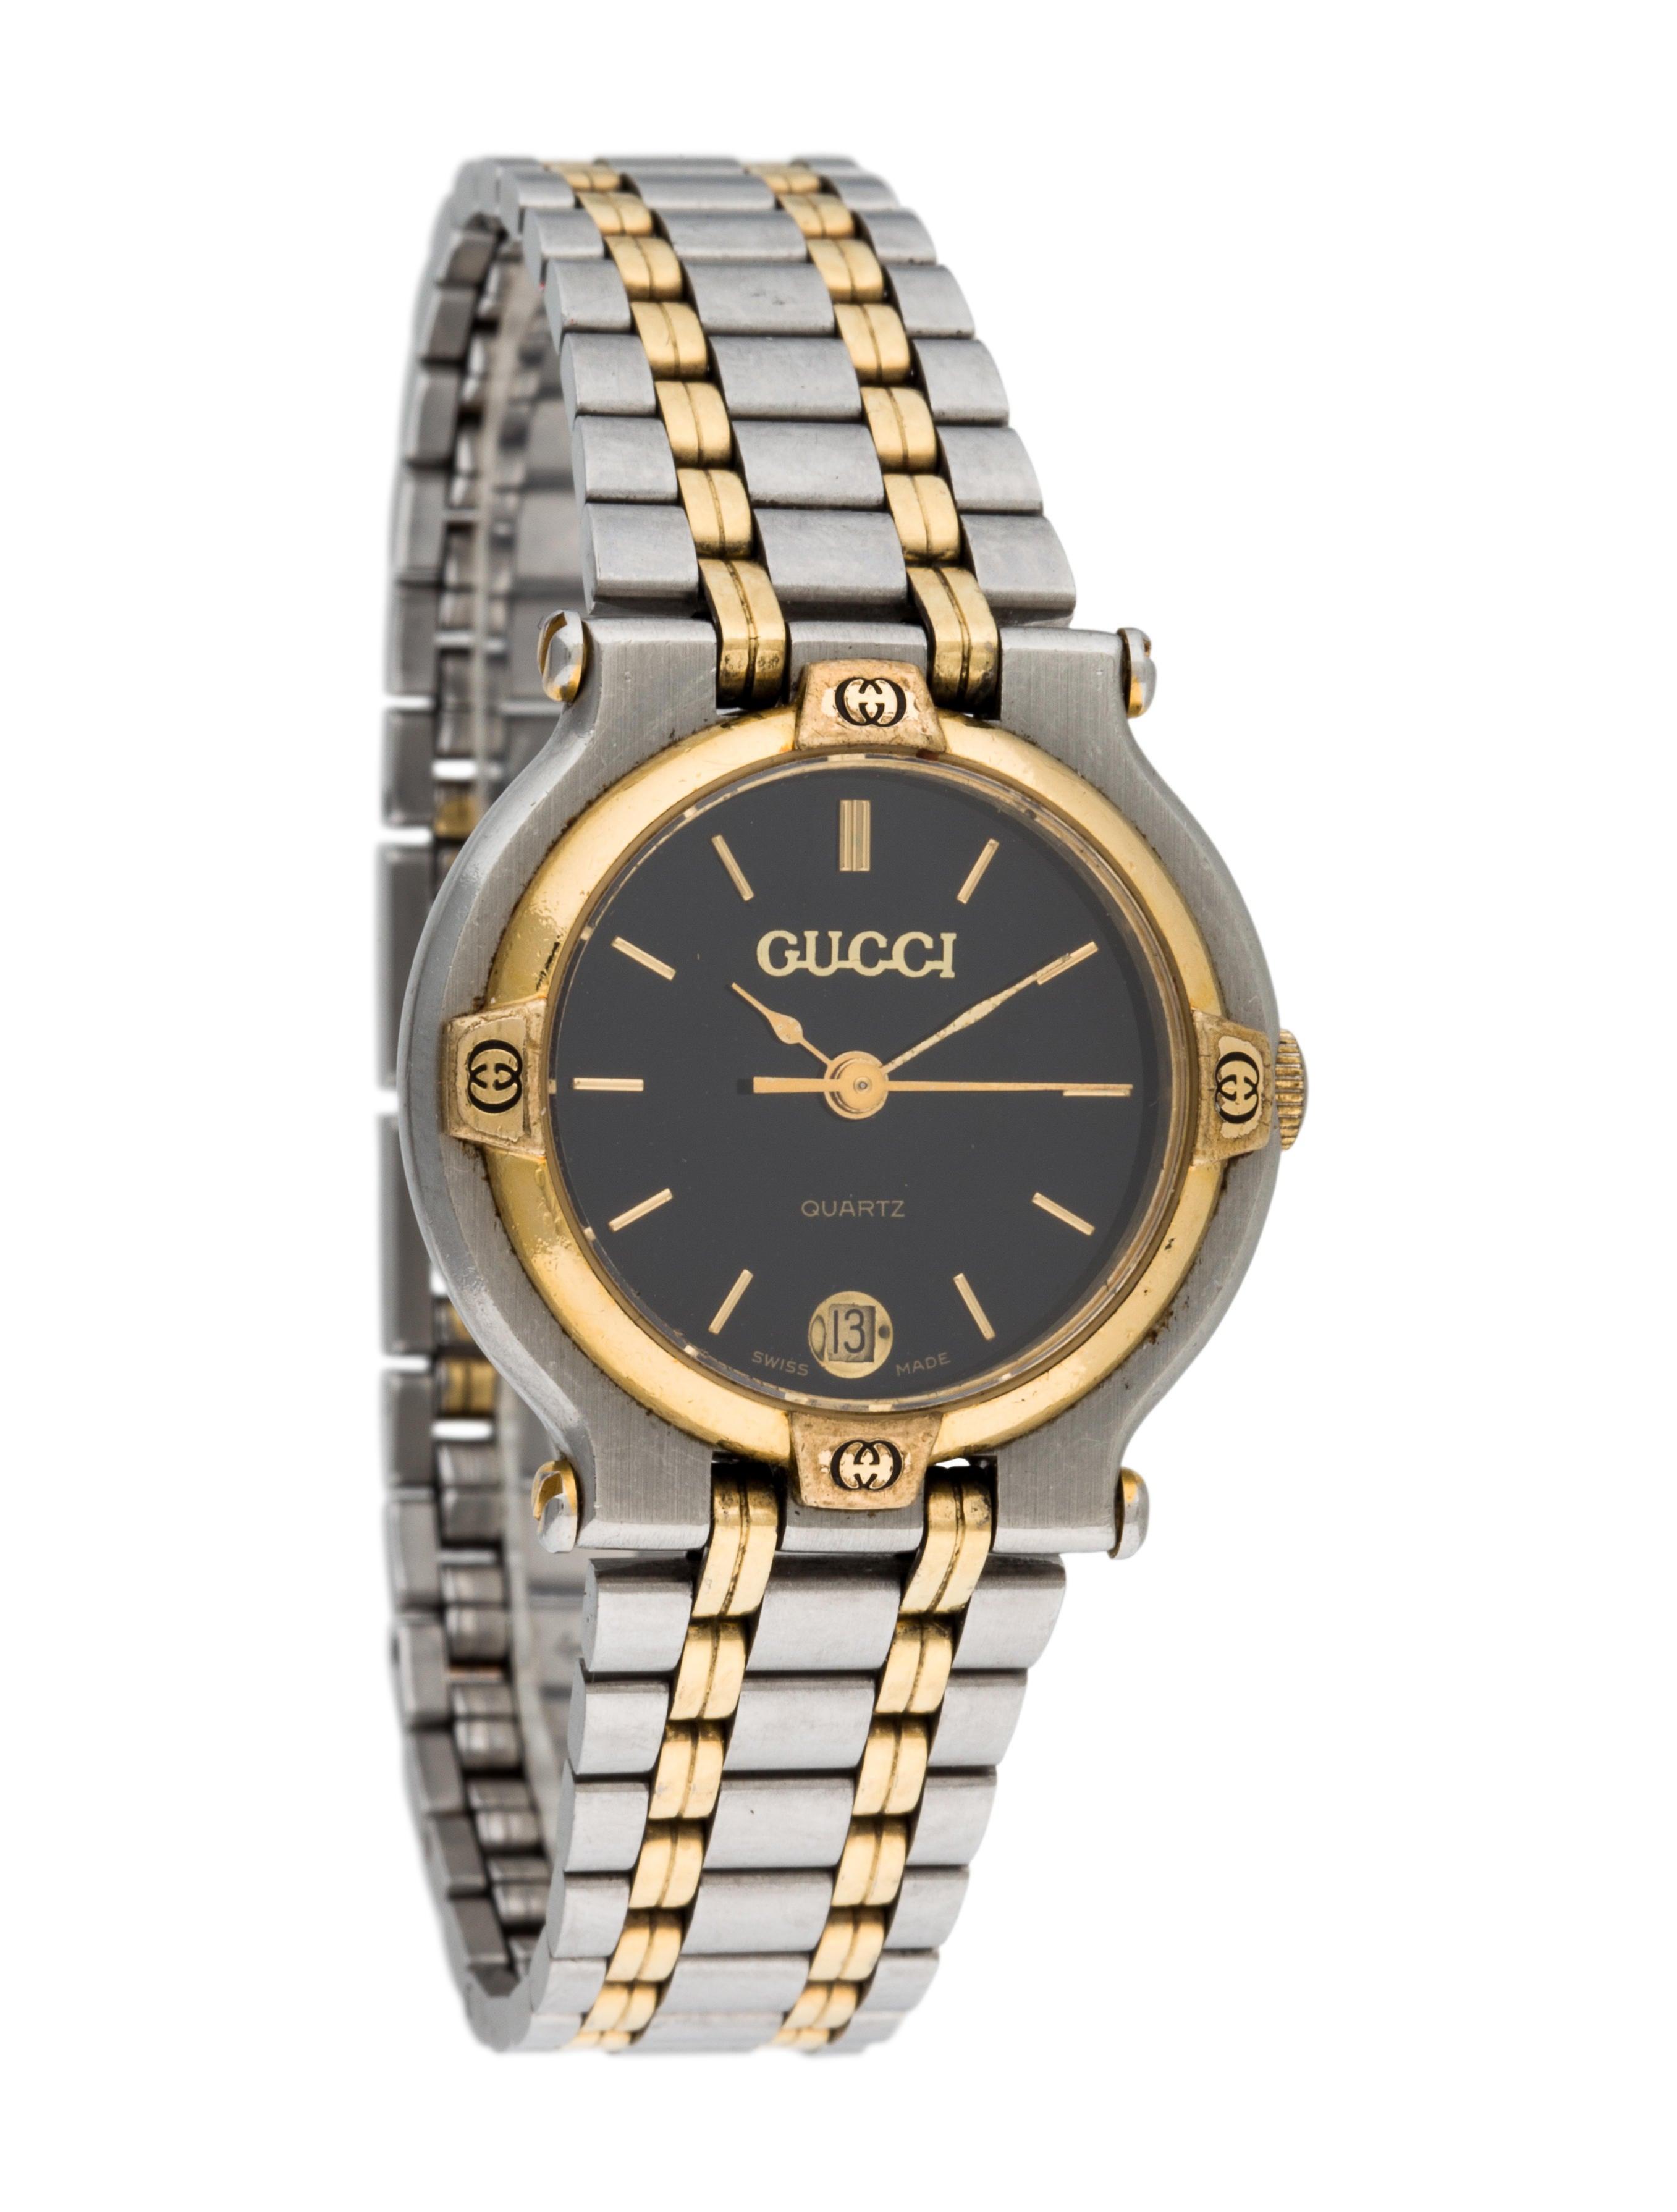 c4503538ae8 Gucci 9000L Watch - Bracelet - GUC80613